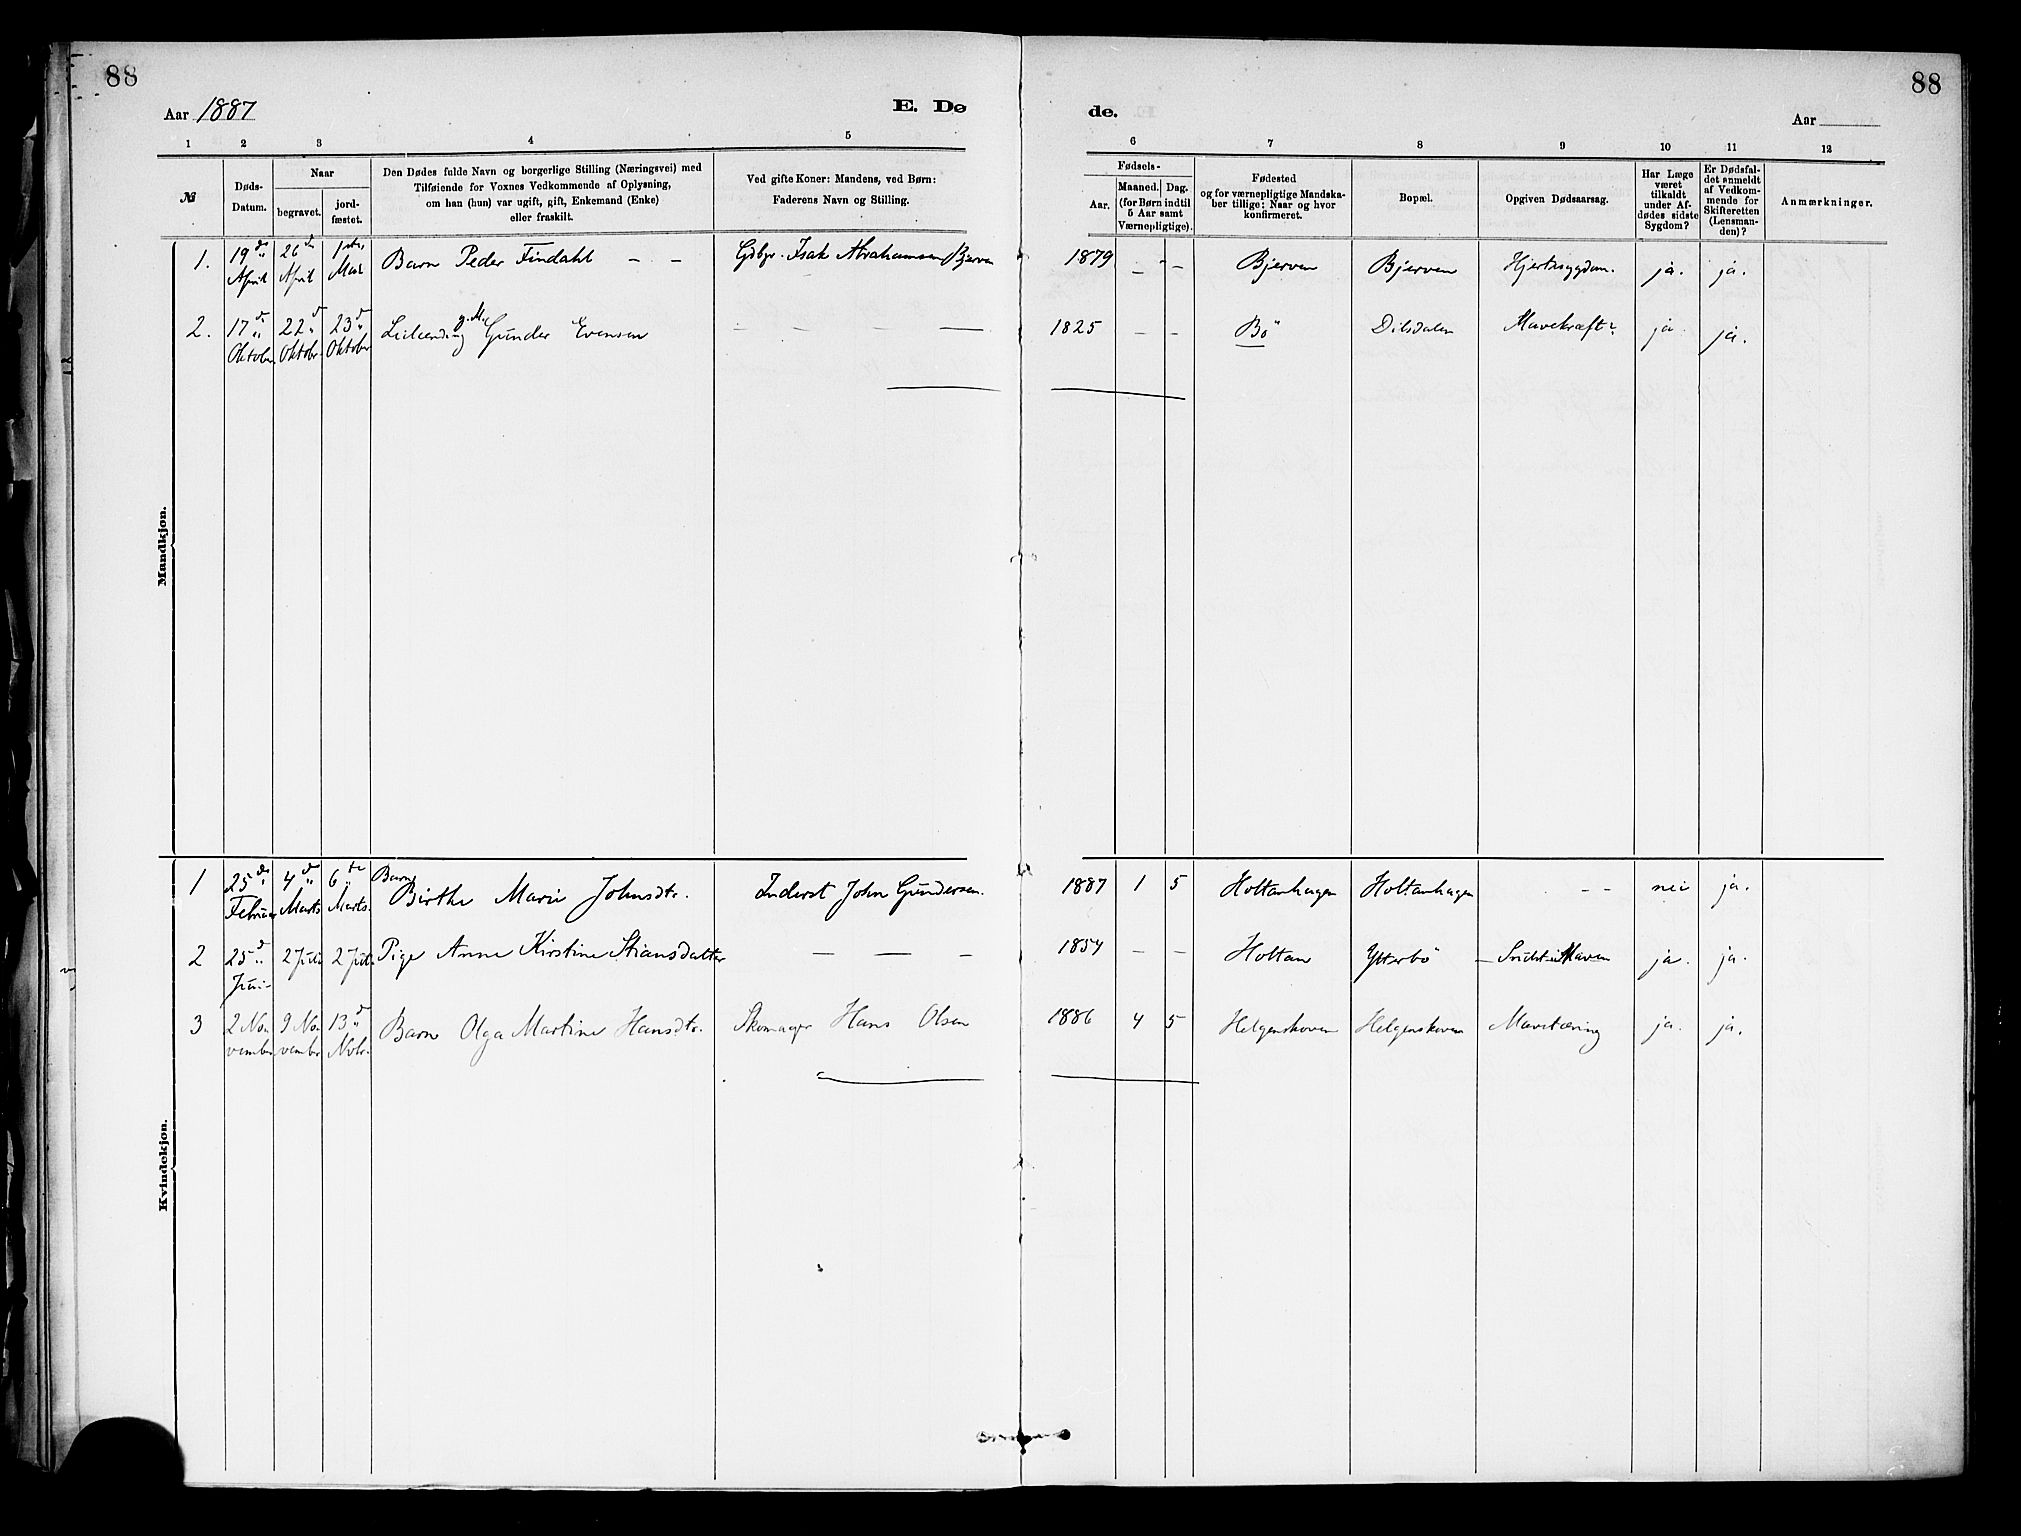 SAKO, Holla kirkebøker, F/Fa/L0009: Ministerialbok nr. 9, 1881-1897, s. 88